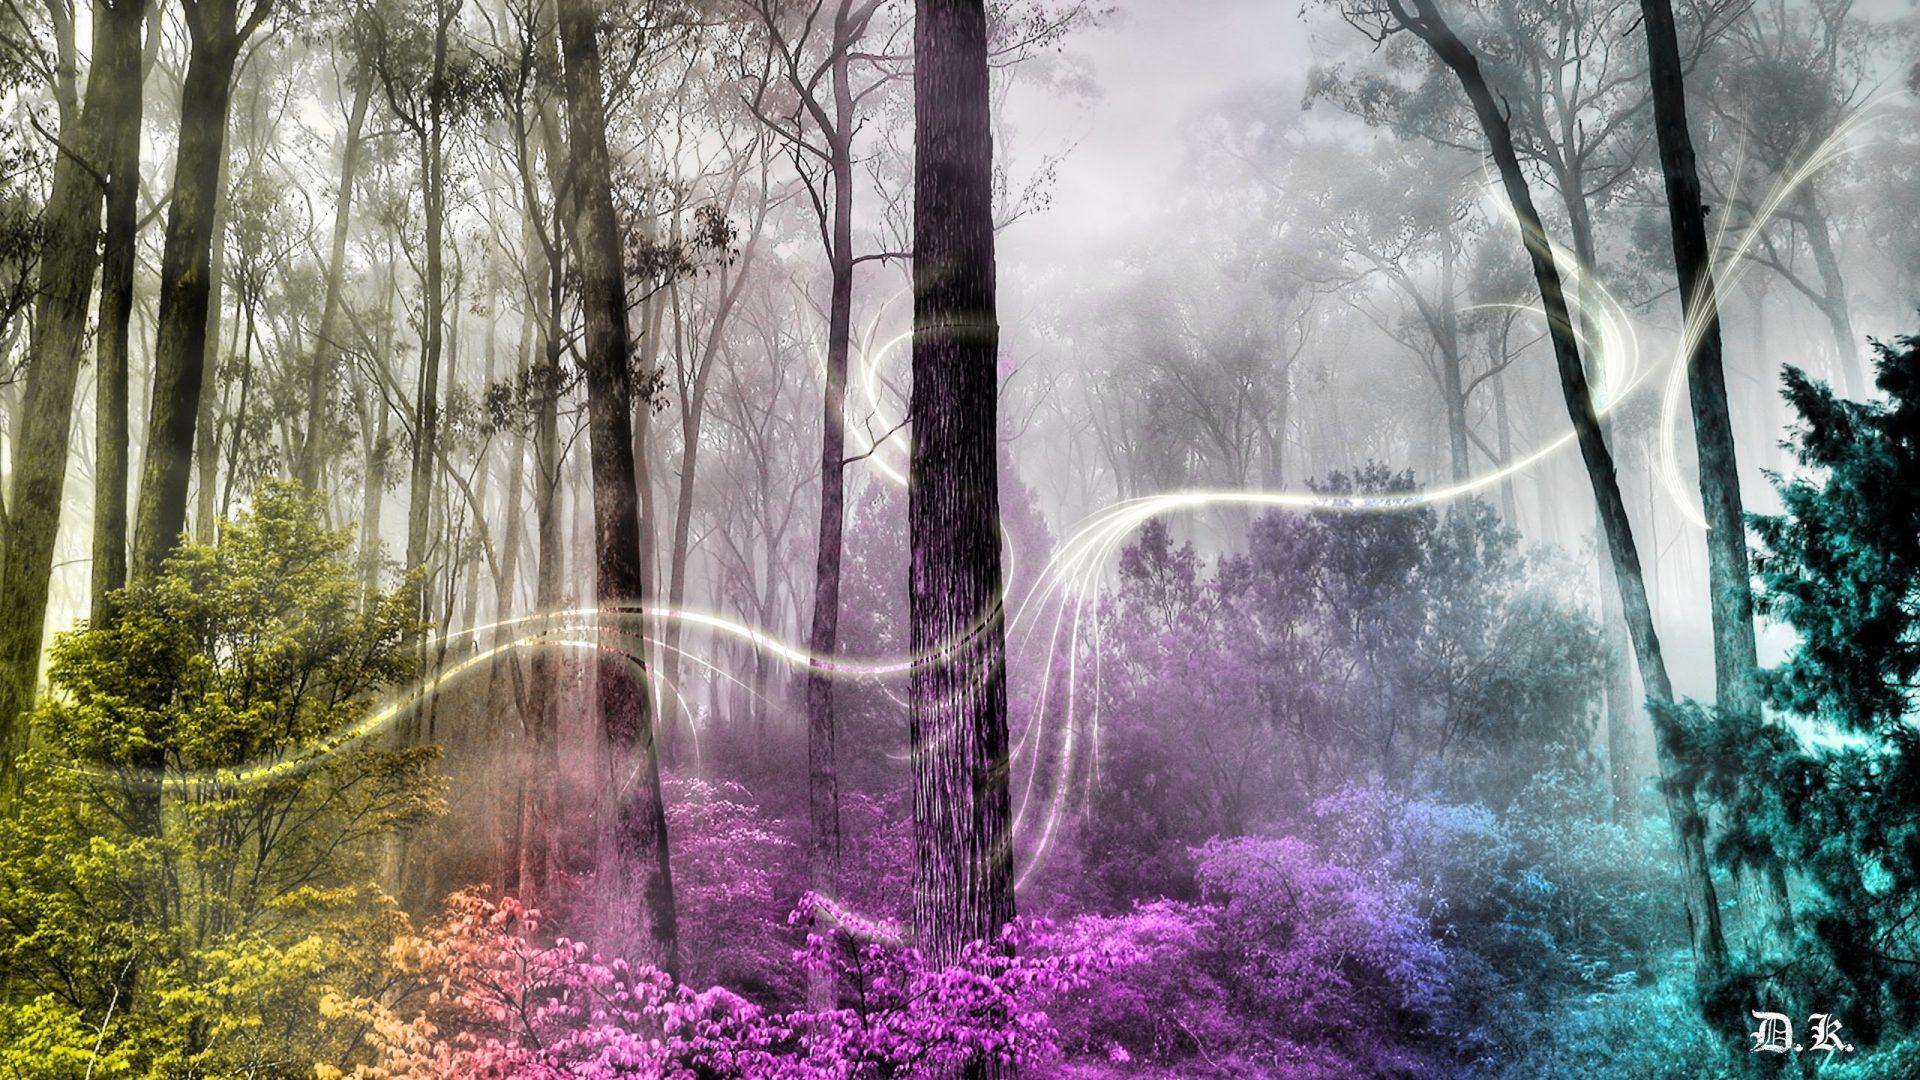 Unicorn Quotes Wallpaper Enchanted Forest Wallpapers Hd Pixelstalk Net